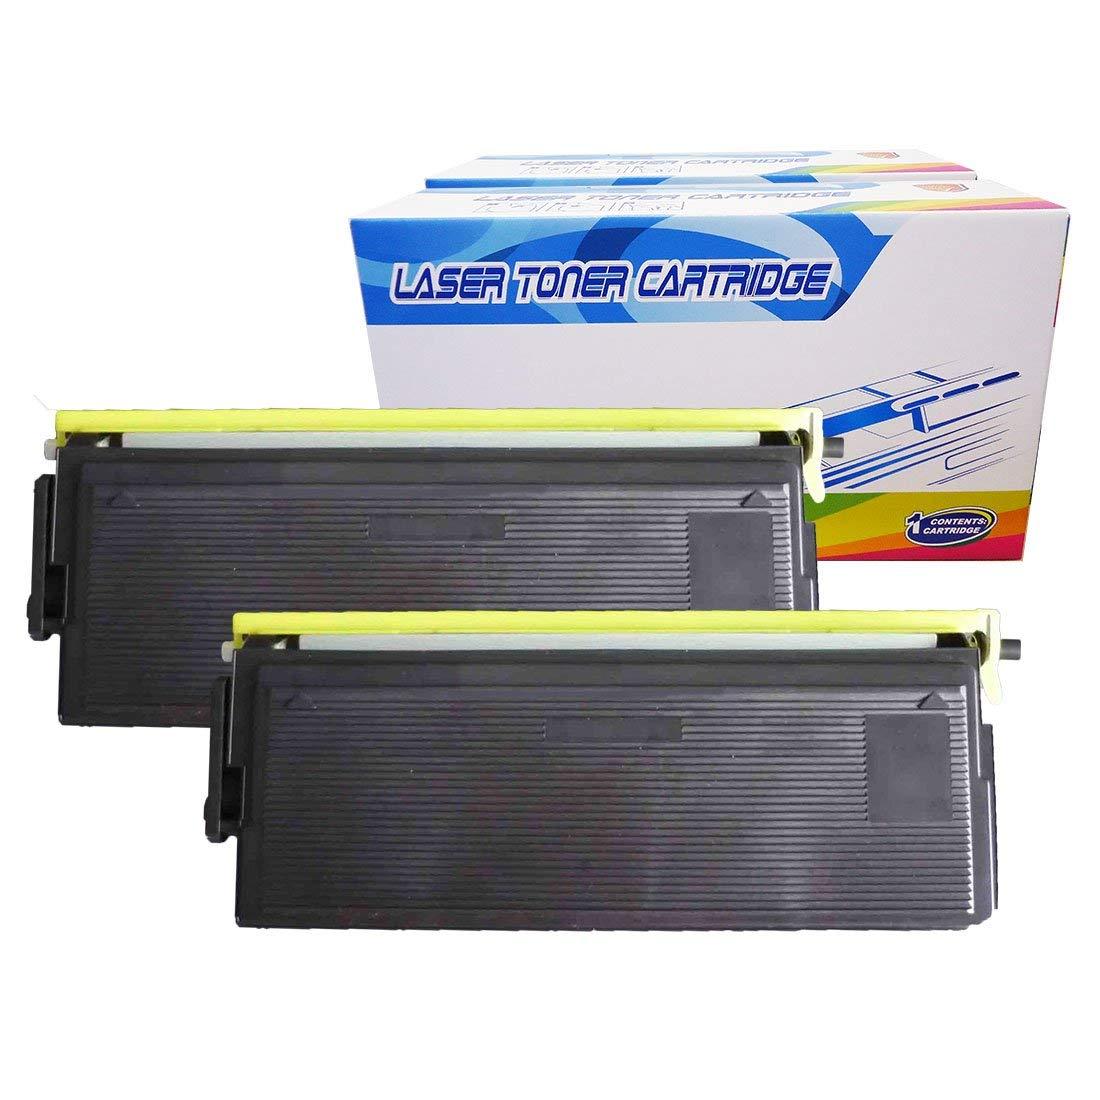 3x TN570 TN-570 TN540 TN-540 Toner for  HL 5140 8440